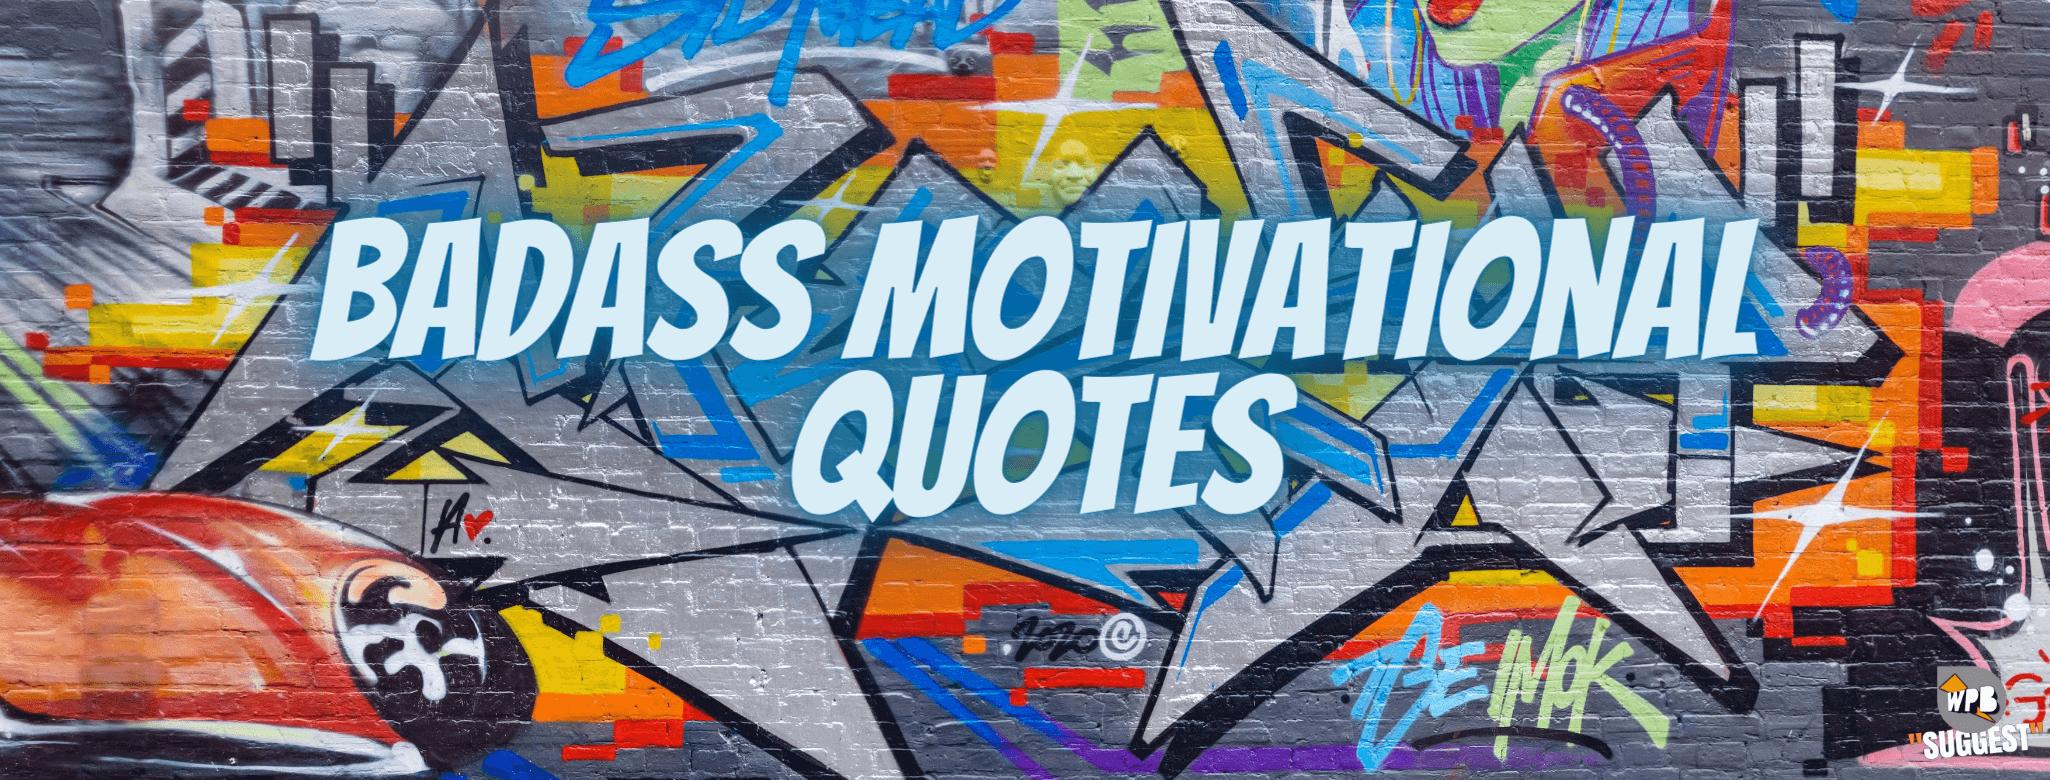 Badass Motivational Quotes